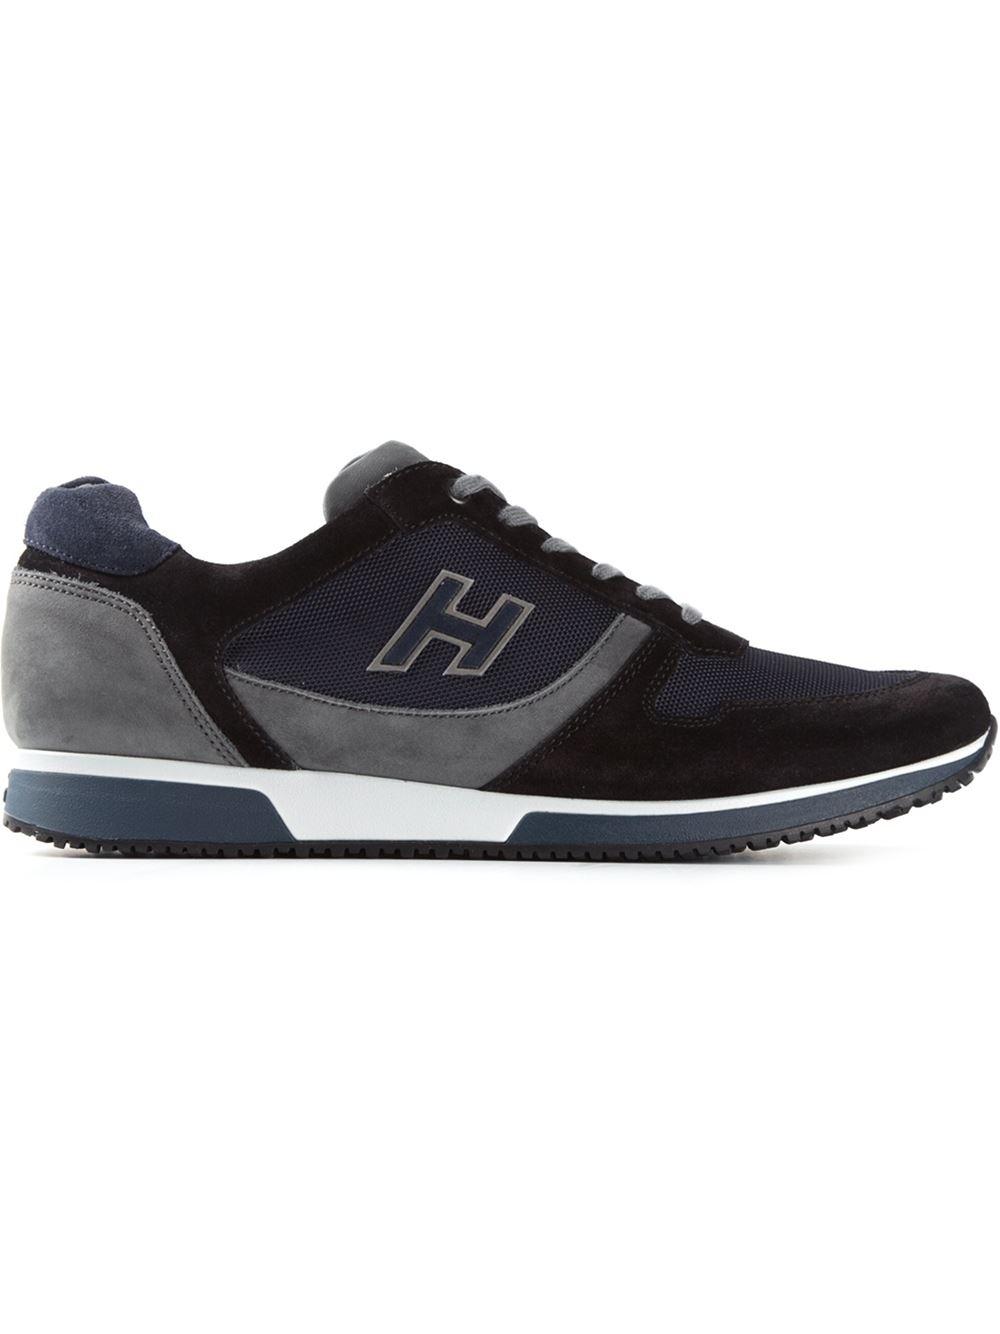 Hogan 'H198' Sneakers in Blue for Men - Lyst